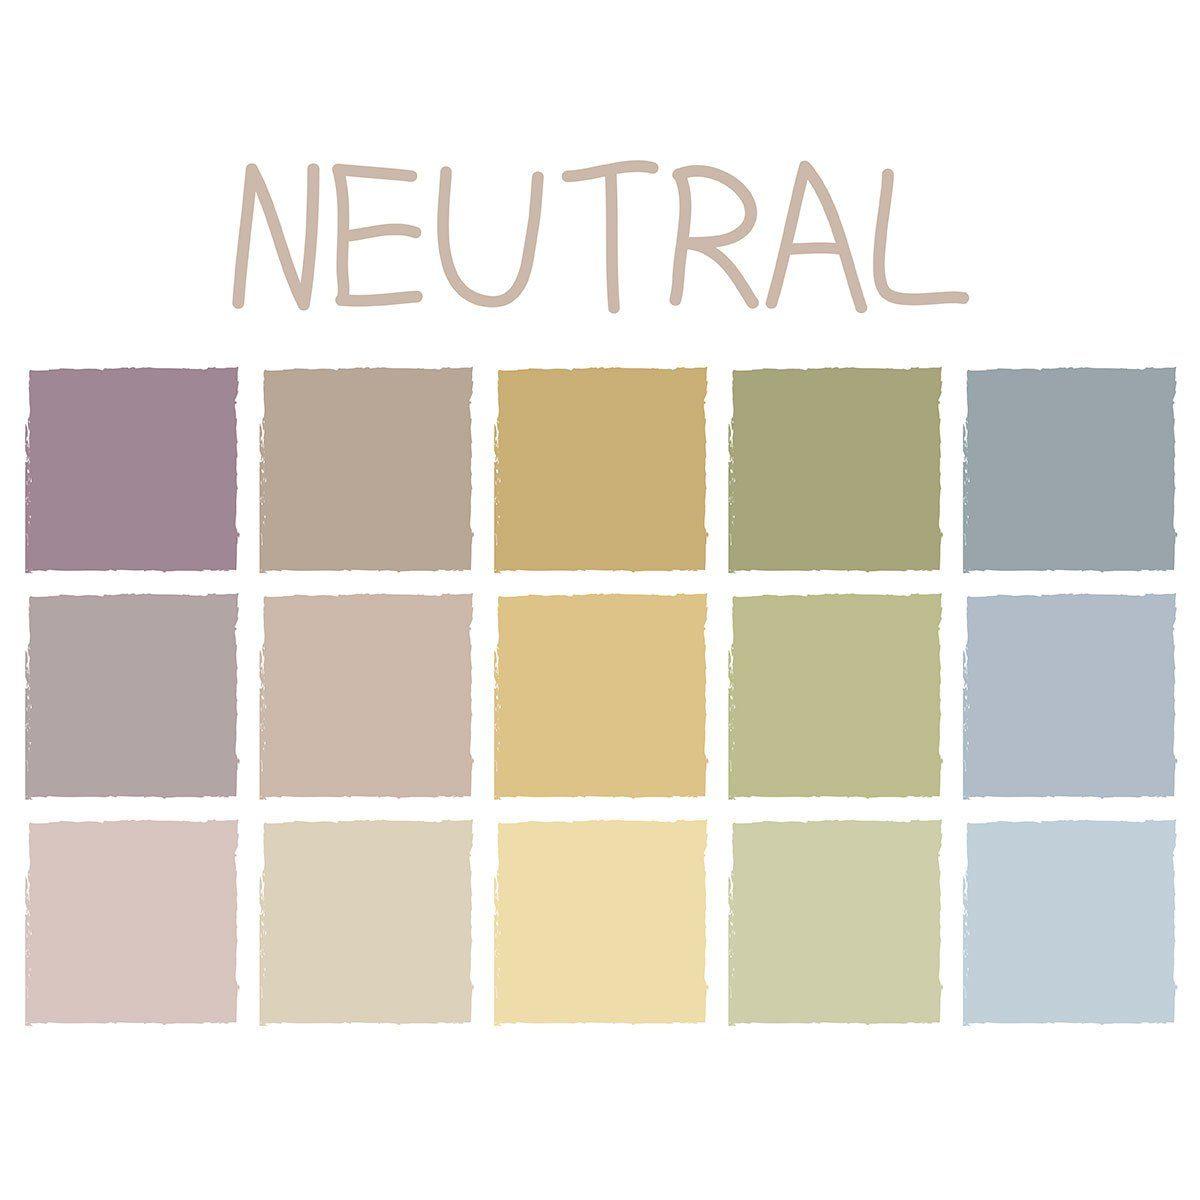 Neutral Palette